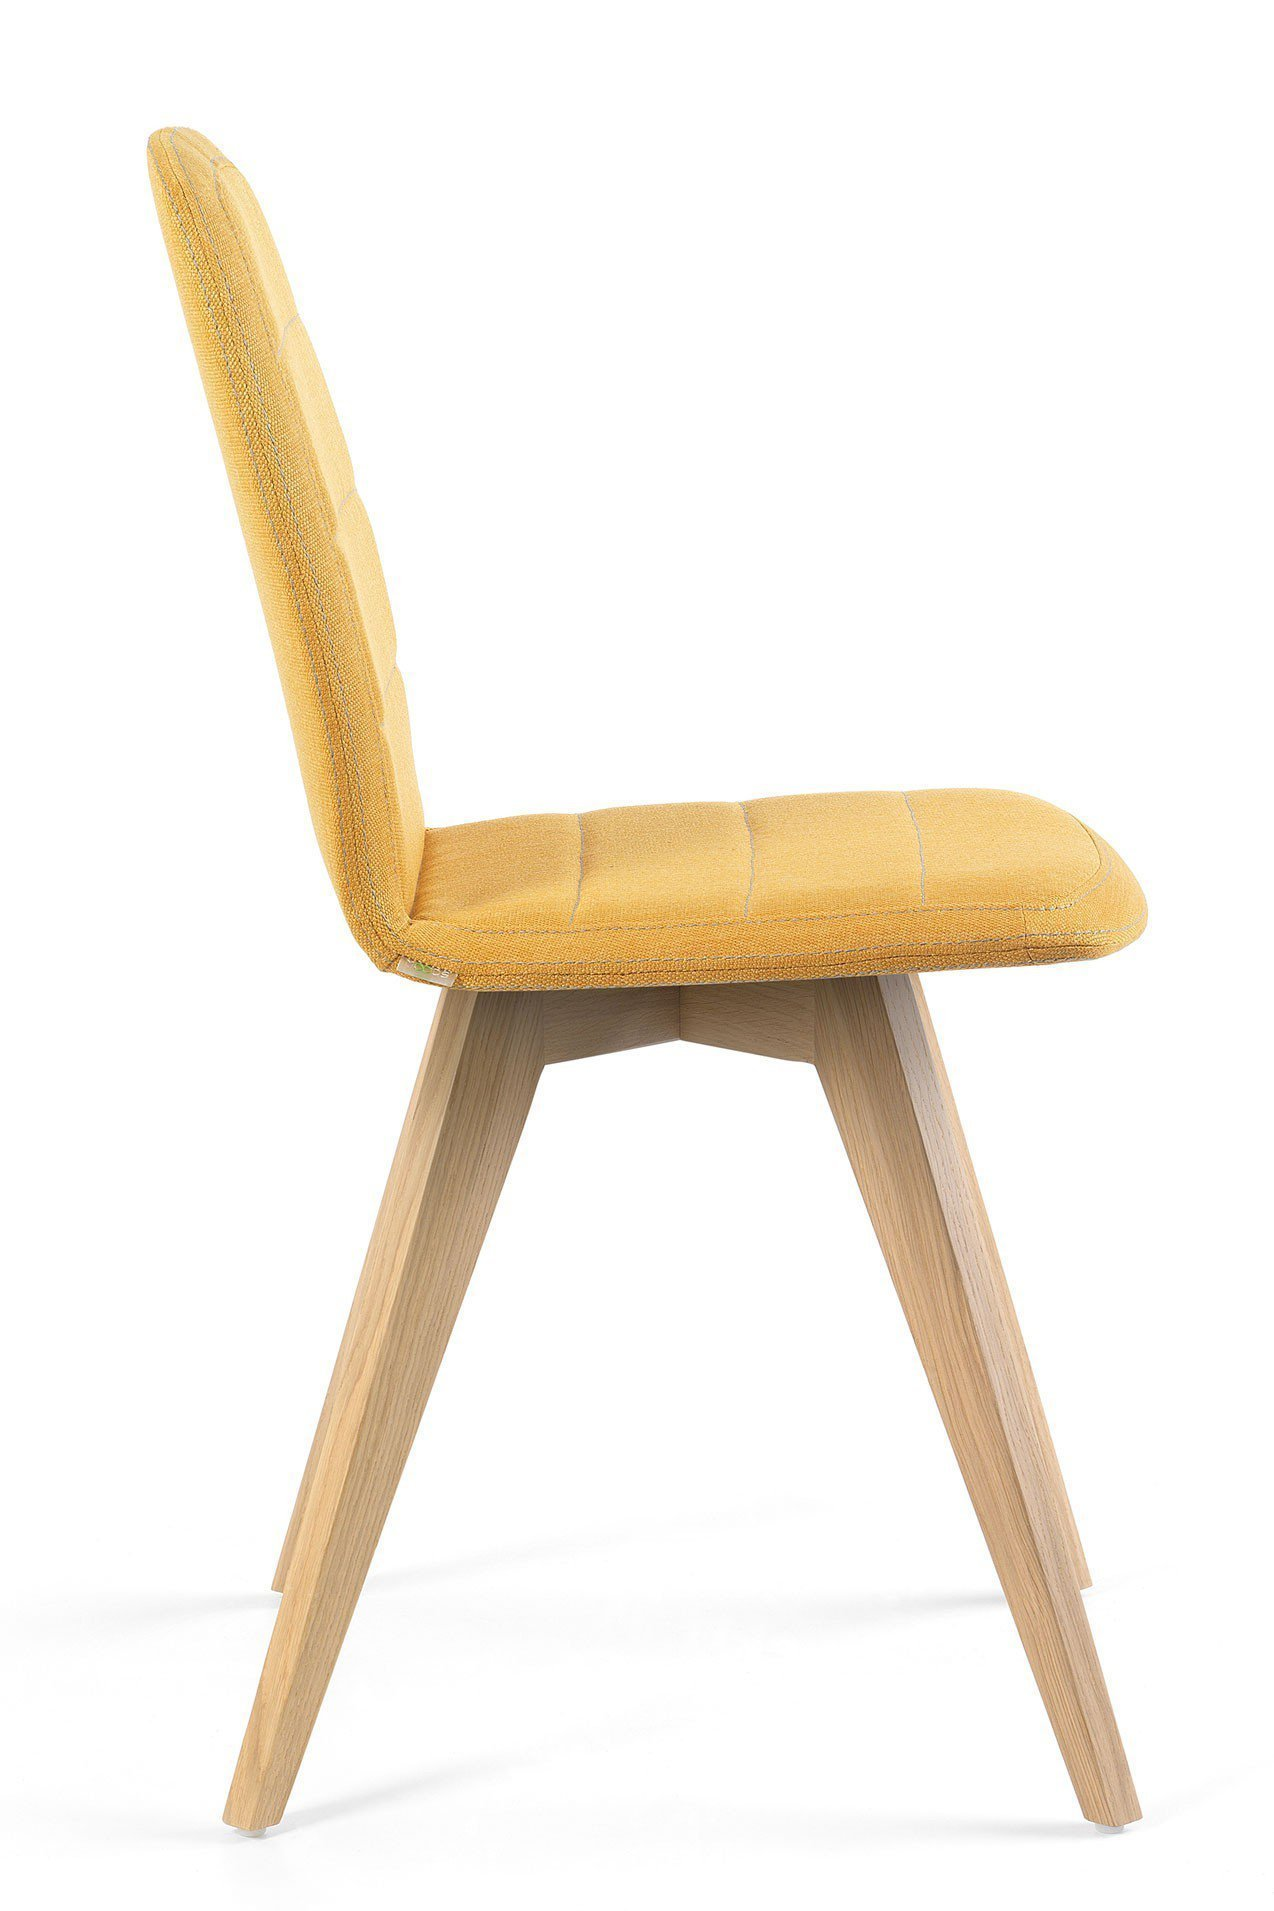 mobitec stuhl mood 12 uni eiche gelb m bel letz ihr online shop. Black Bedroom Furniture Sets. Home Design Ideas